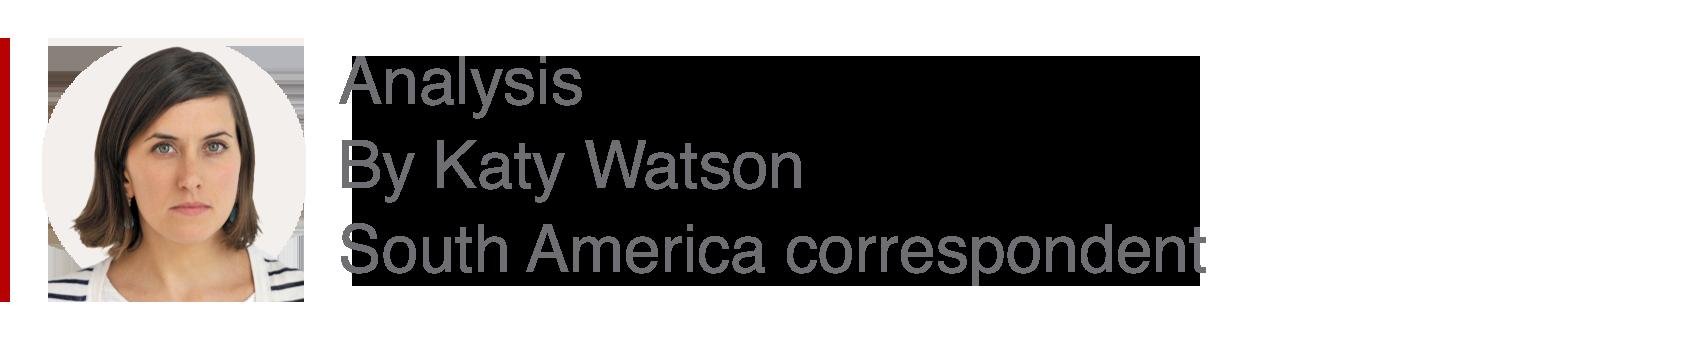 Analysis box by Katy Watson, South America correspondent